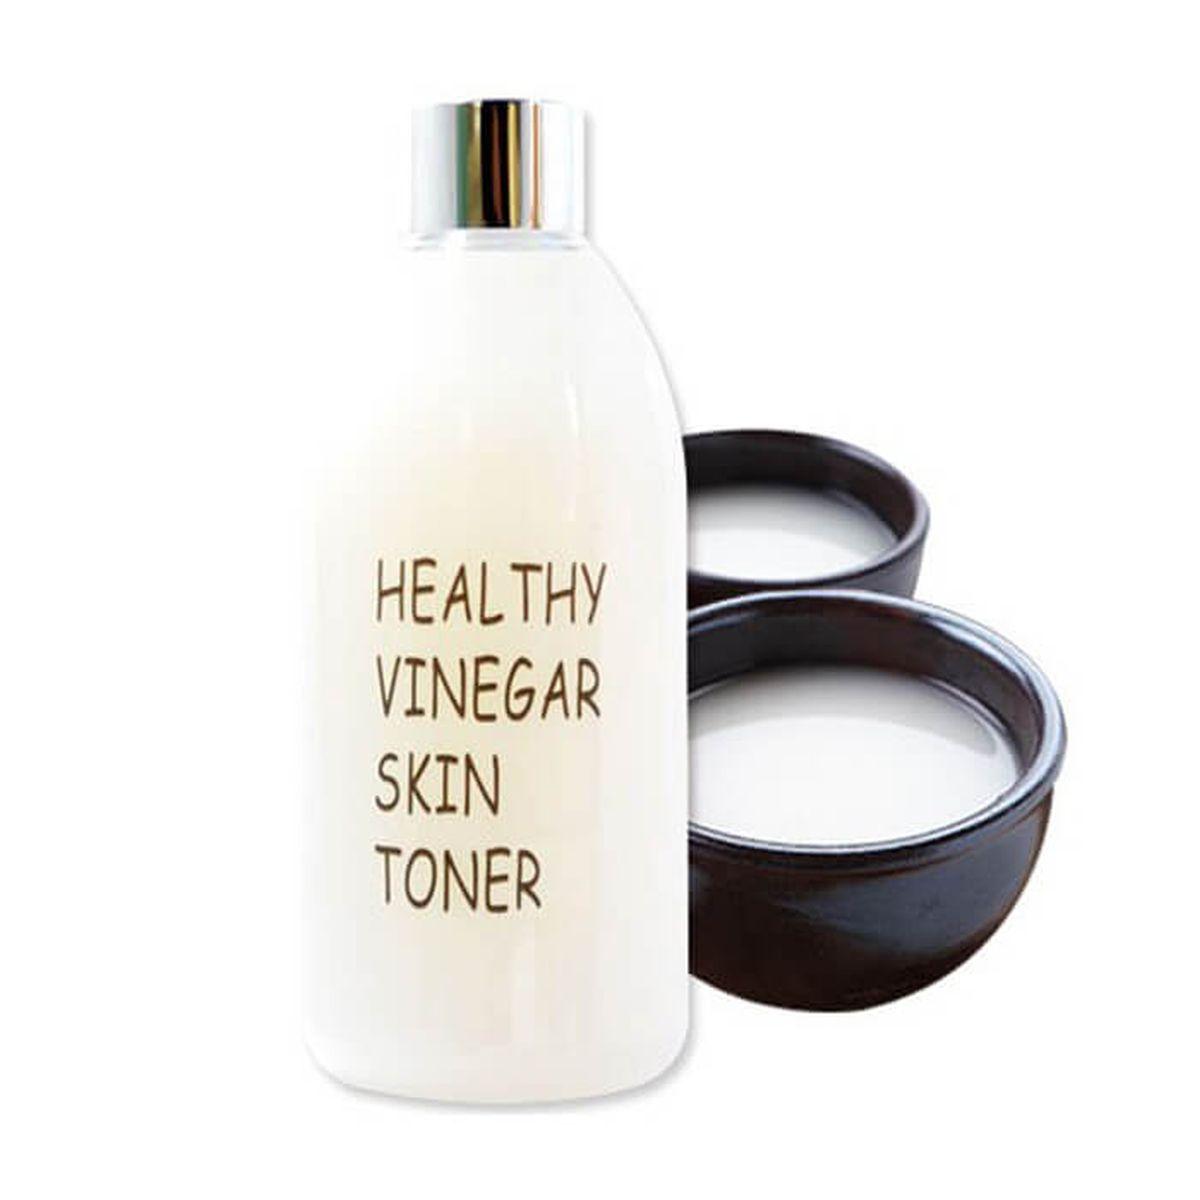 Тоник с рисовым вином Realskin Healthy Vinegar Skin Toner (Raw Rice) - 300 мл